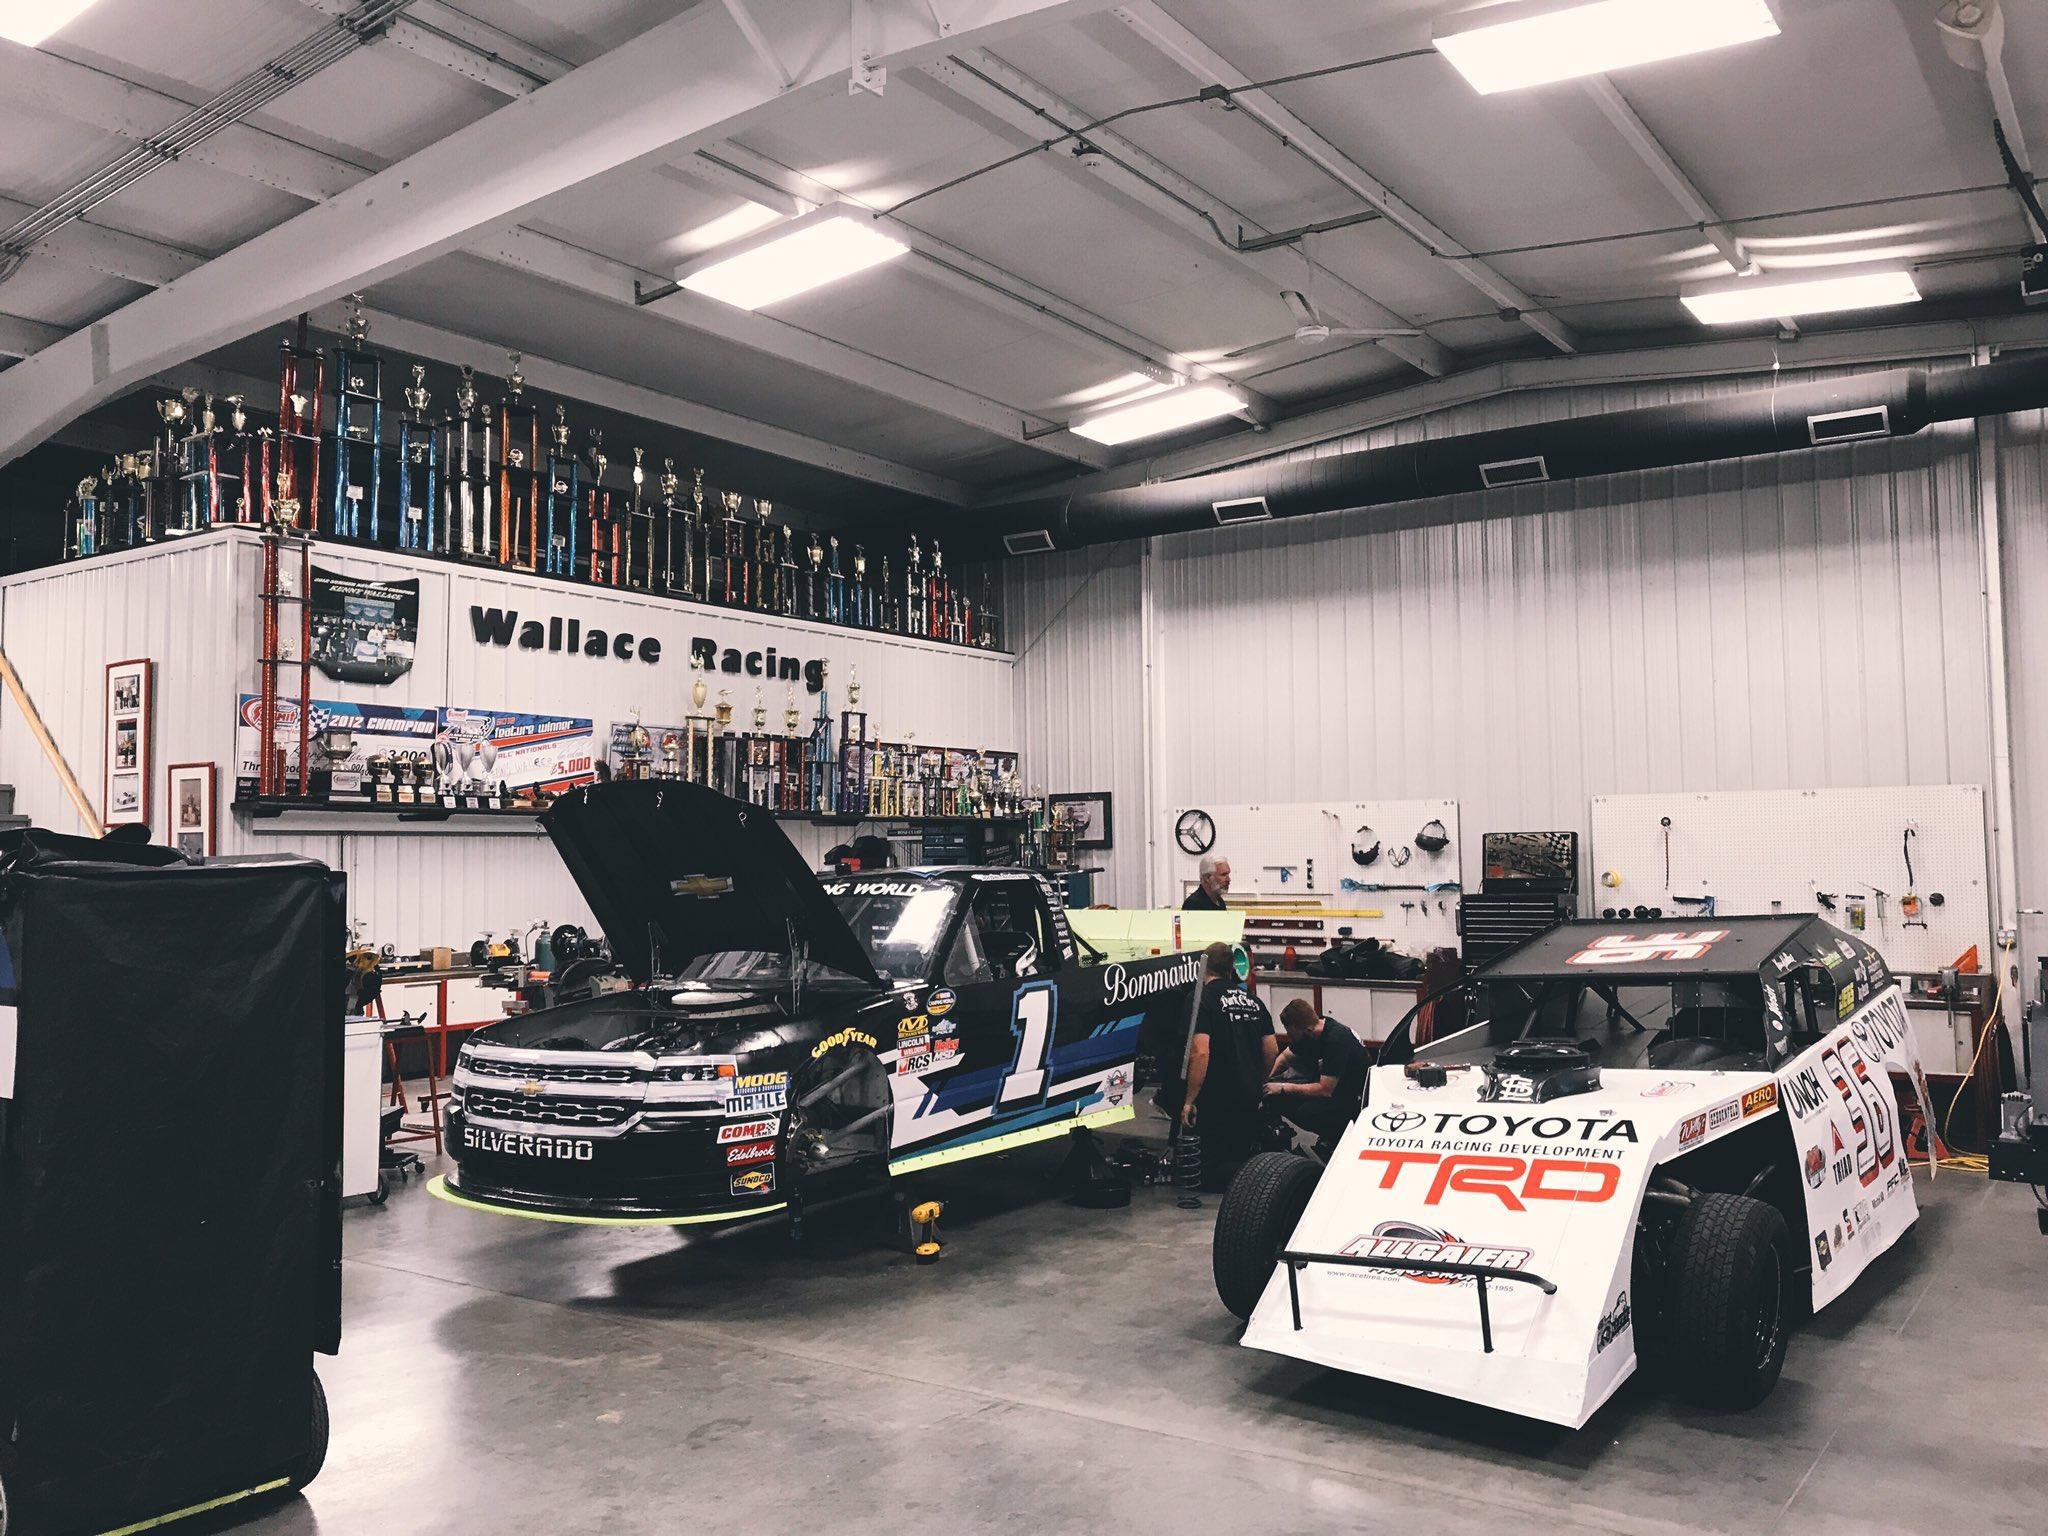 Kenny Wallace Racing Shop / NASCAR Shop - Racing News